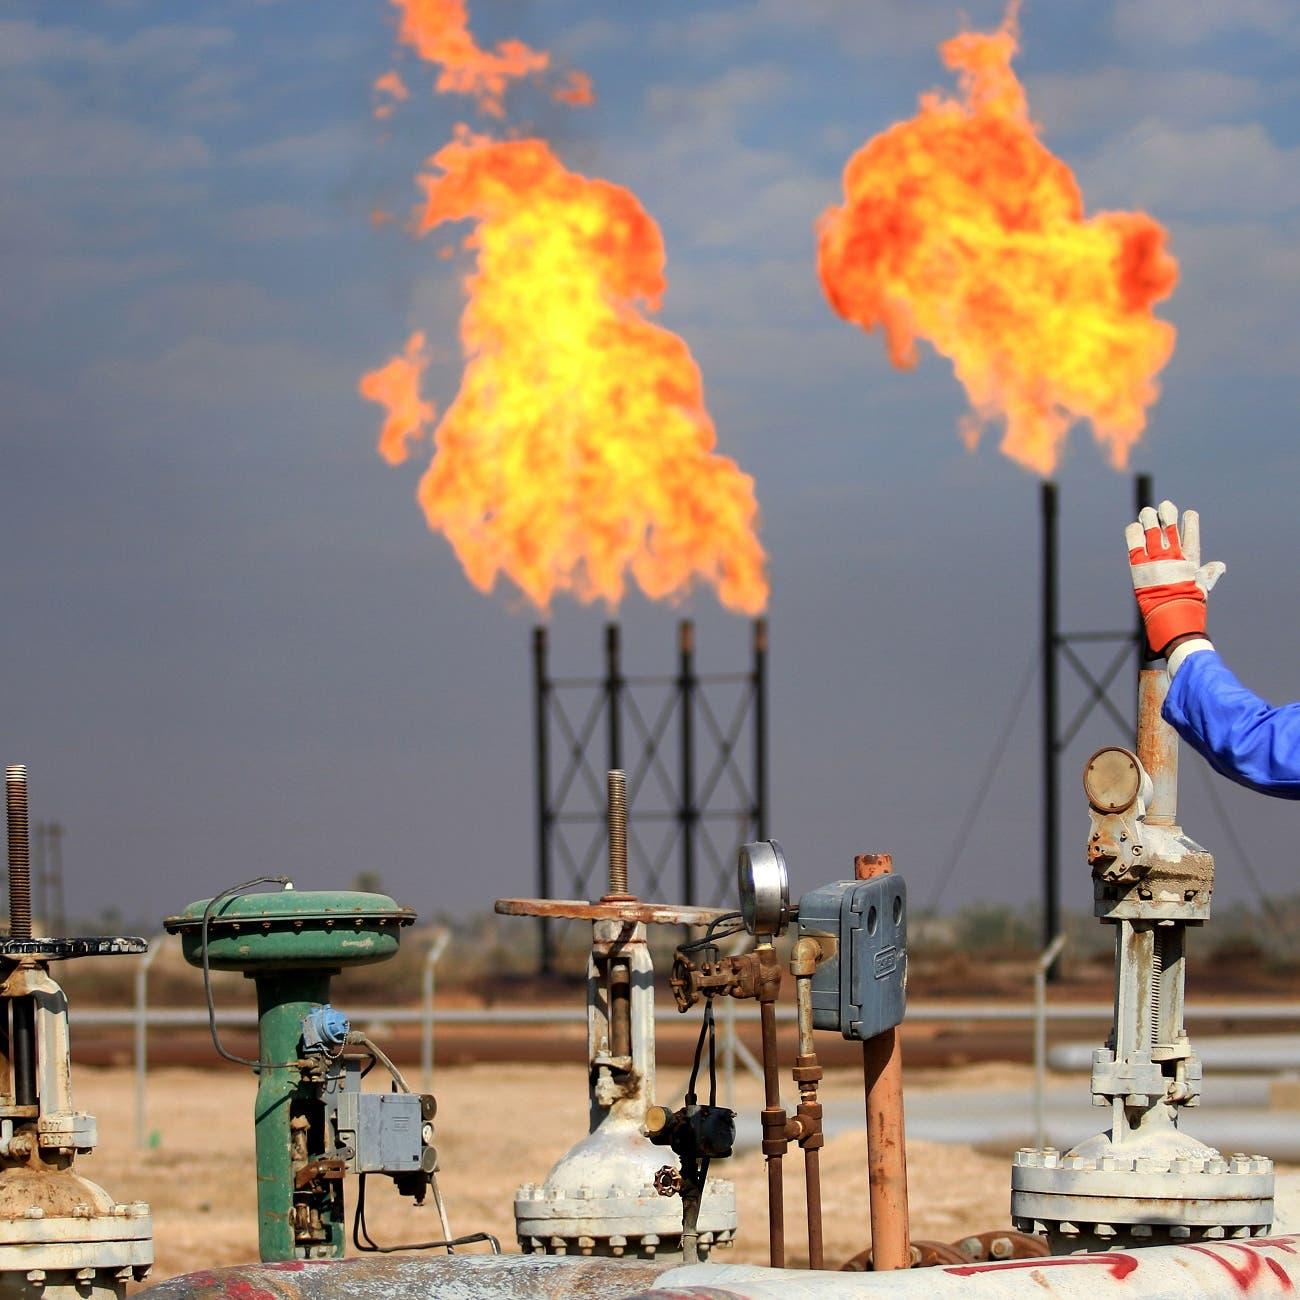 S&P بلاتس للعربية: أسعار الغاز قد تبقى مرتفعة حتى 2024